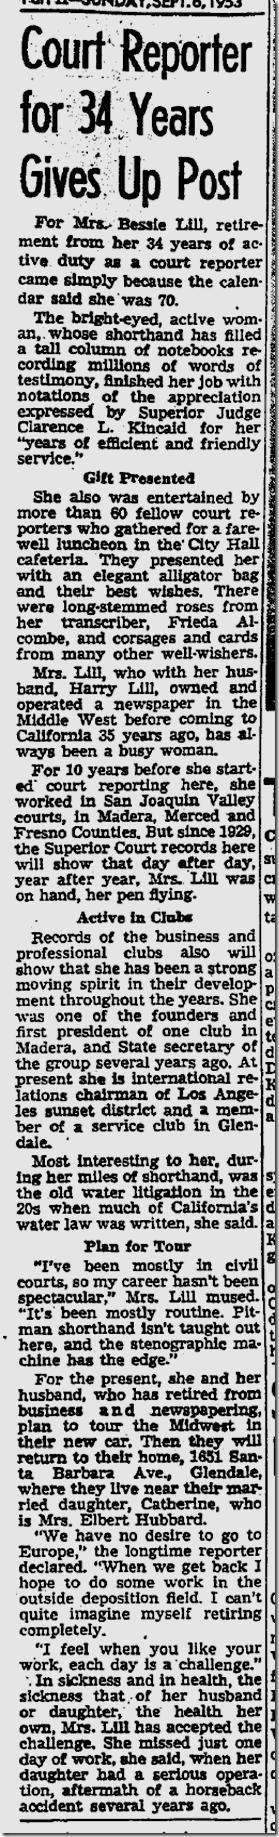 Sept. 6, 1953, Court Reporter